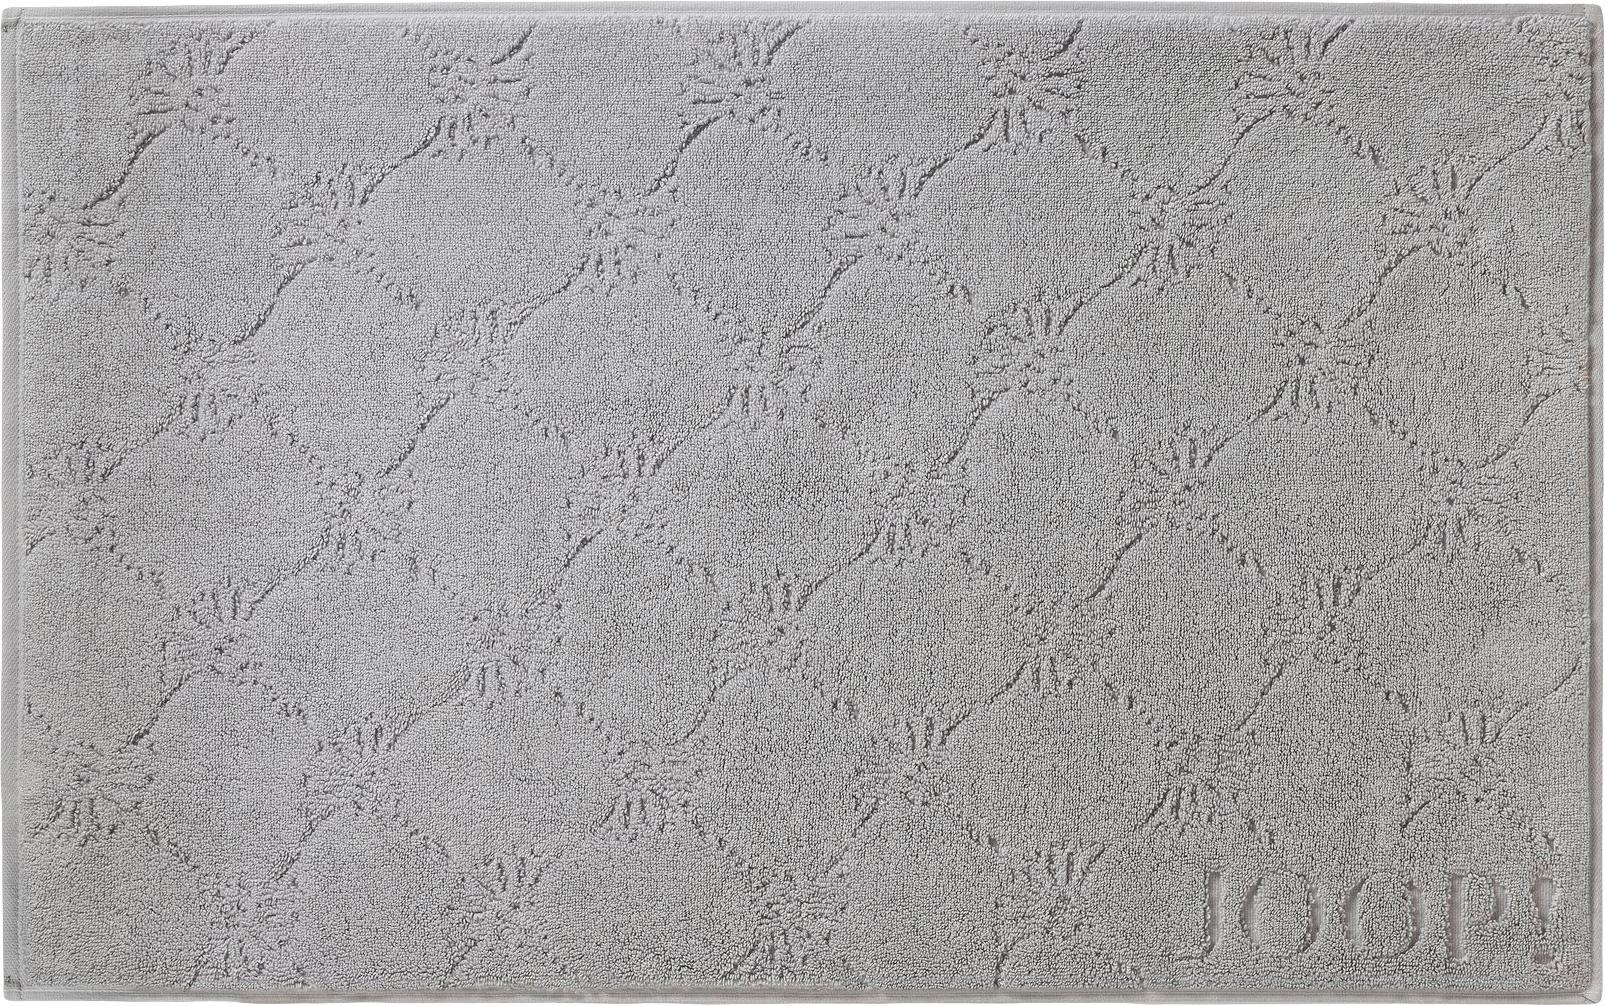 Badvorleger Cornflower, Webart: Walkfrottee, Silbergrau, 50 x 80 cm